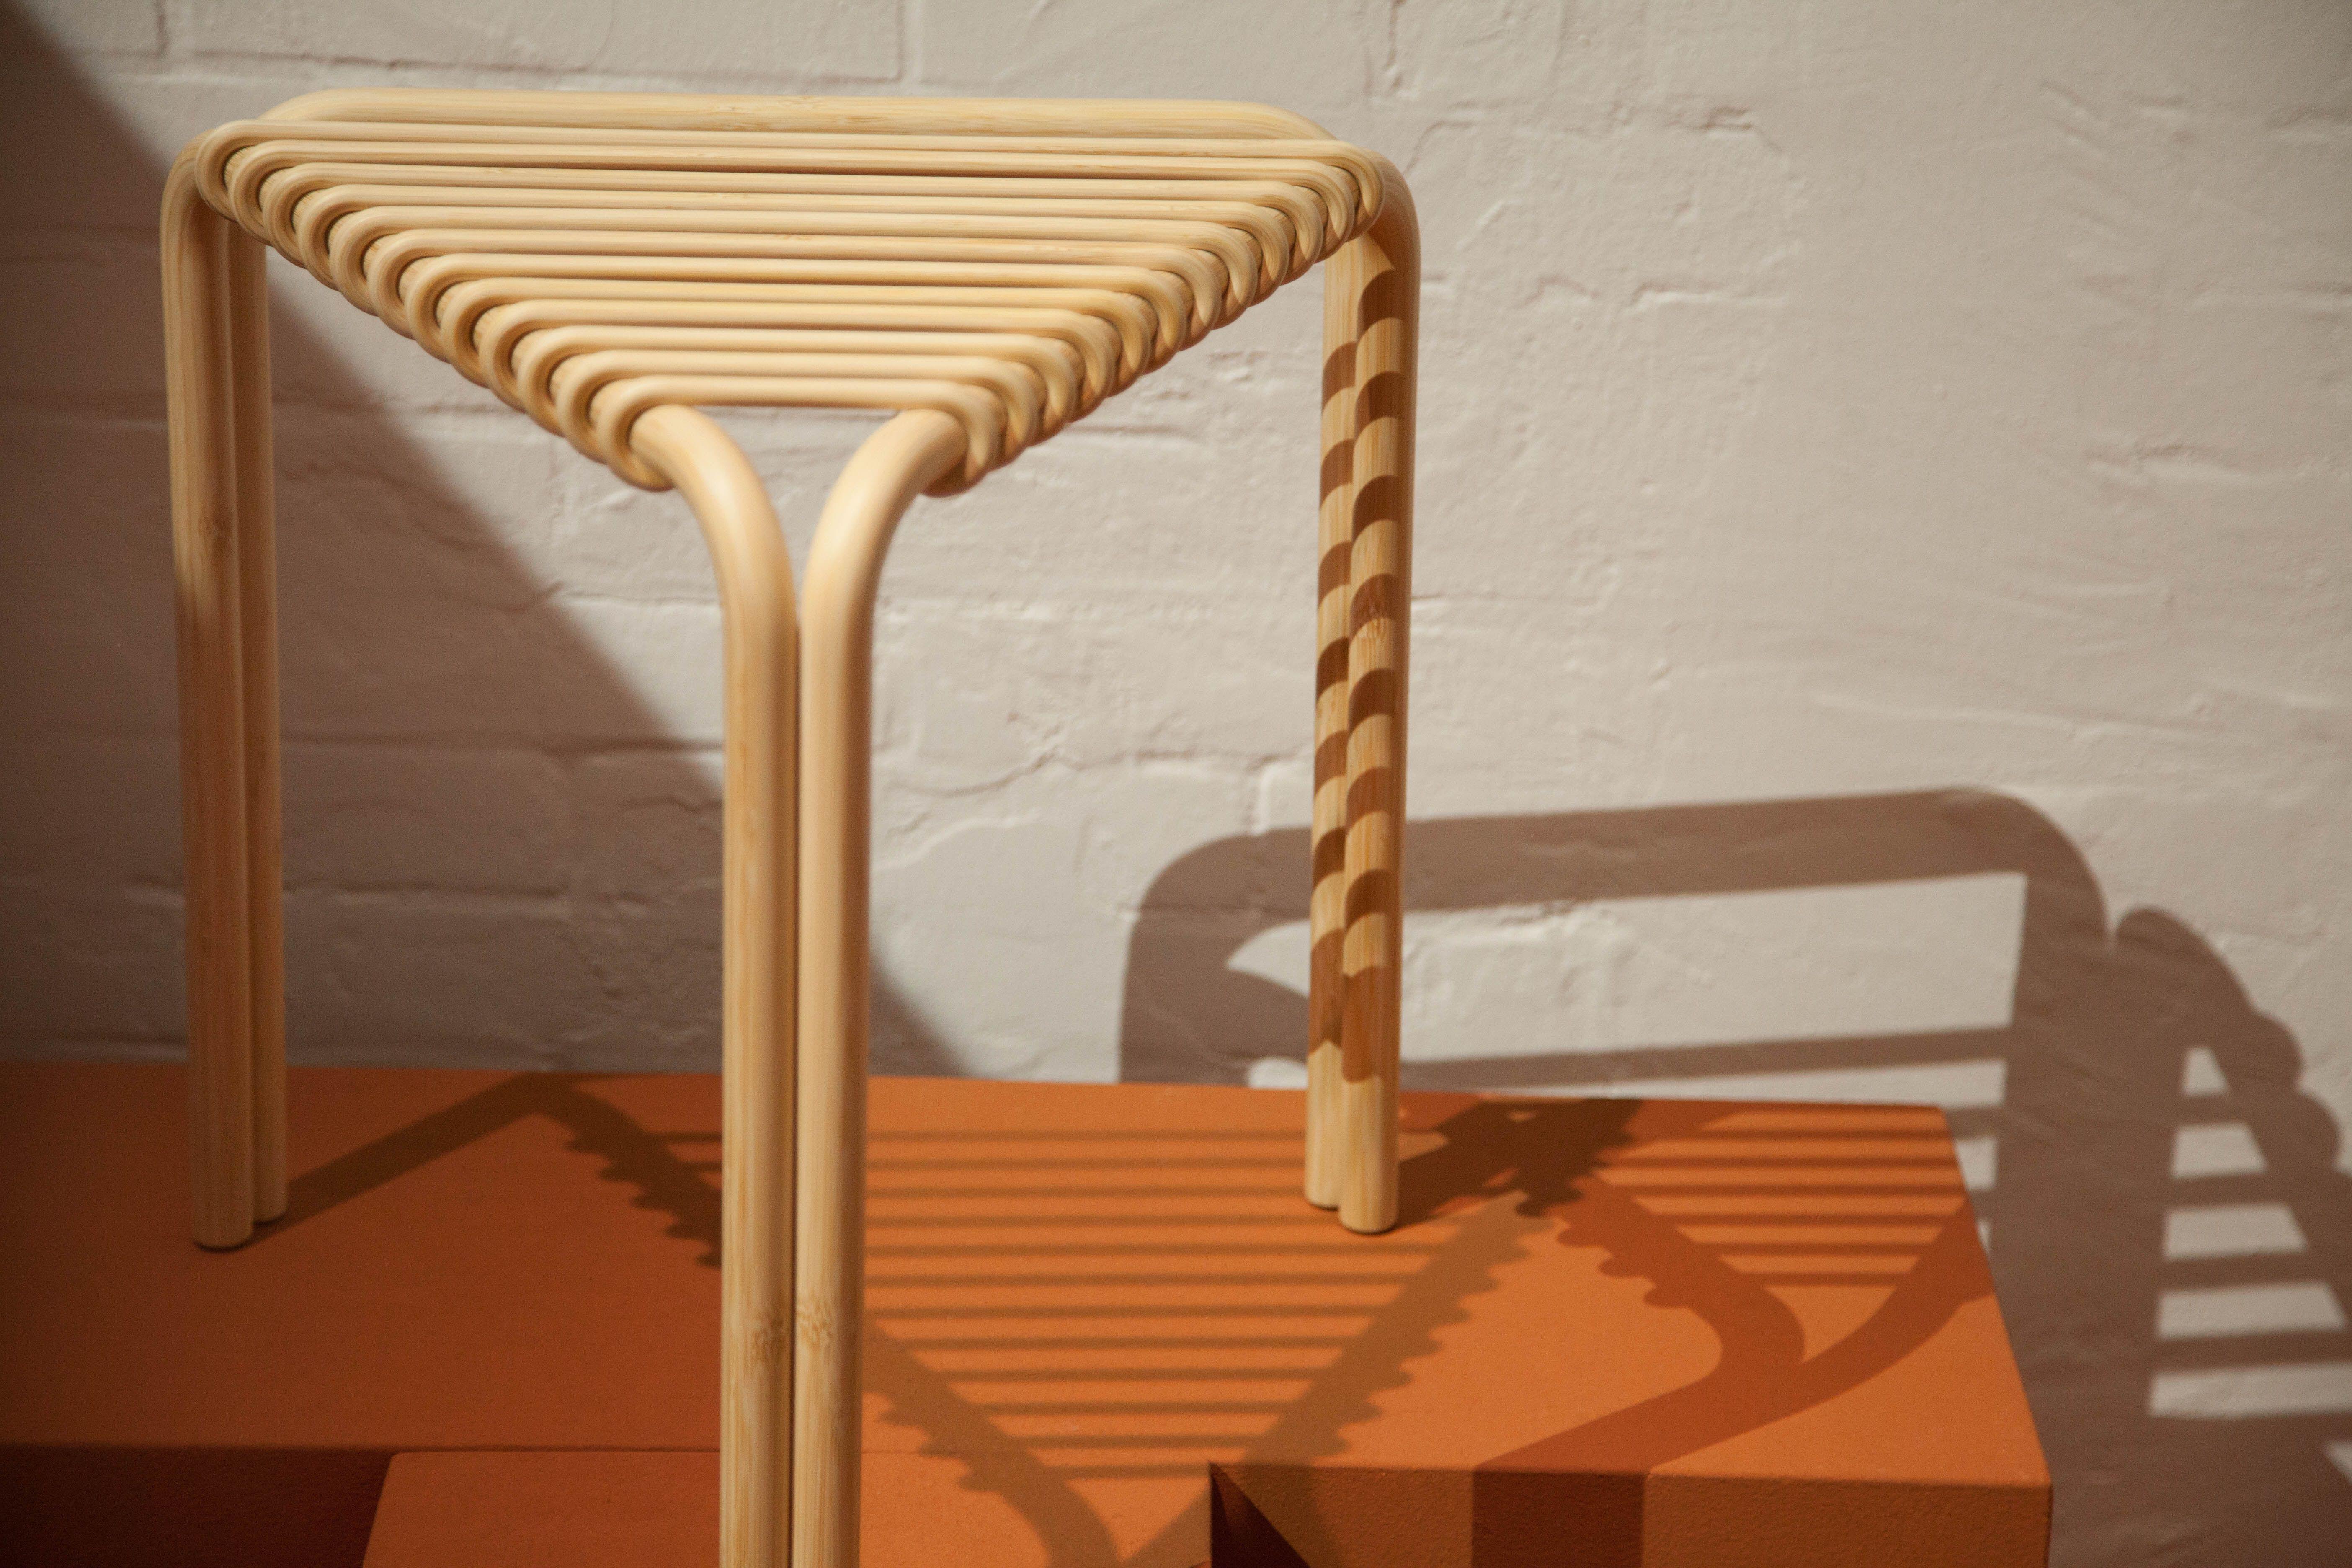 Karumi Triangular Stool by Alvaro Siza for Hermes